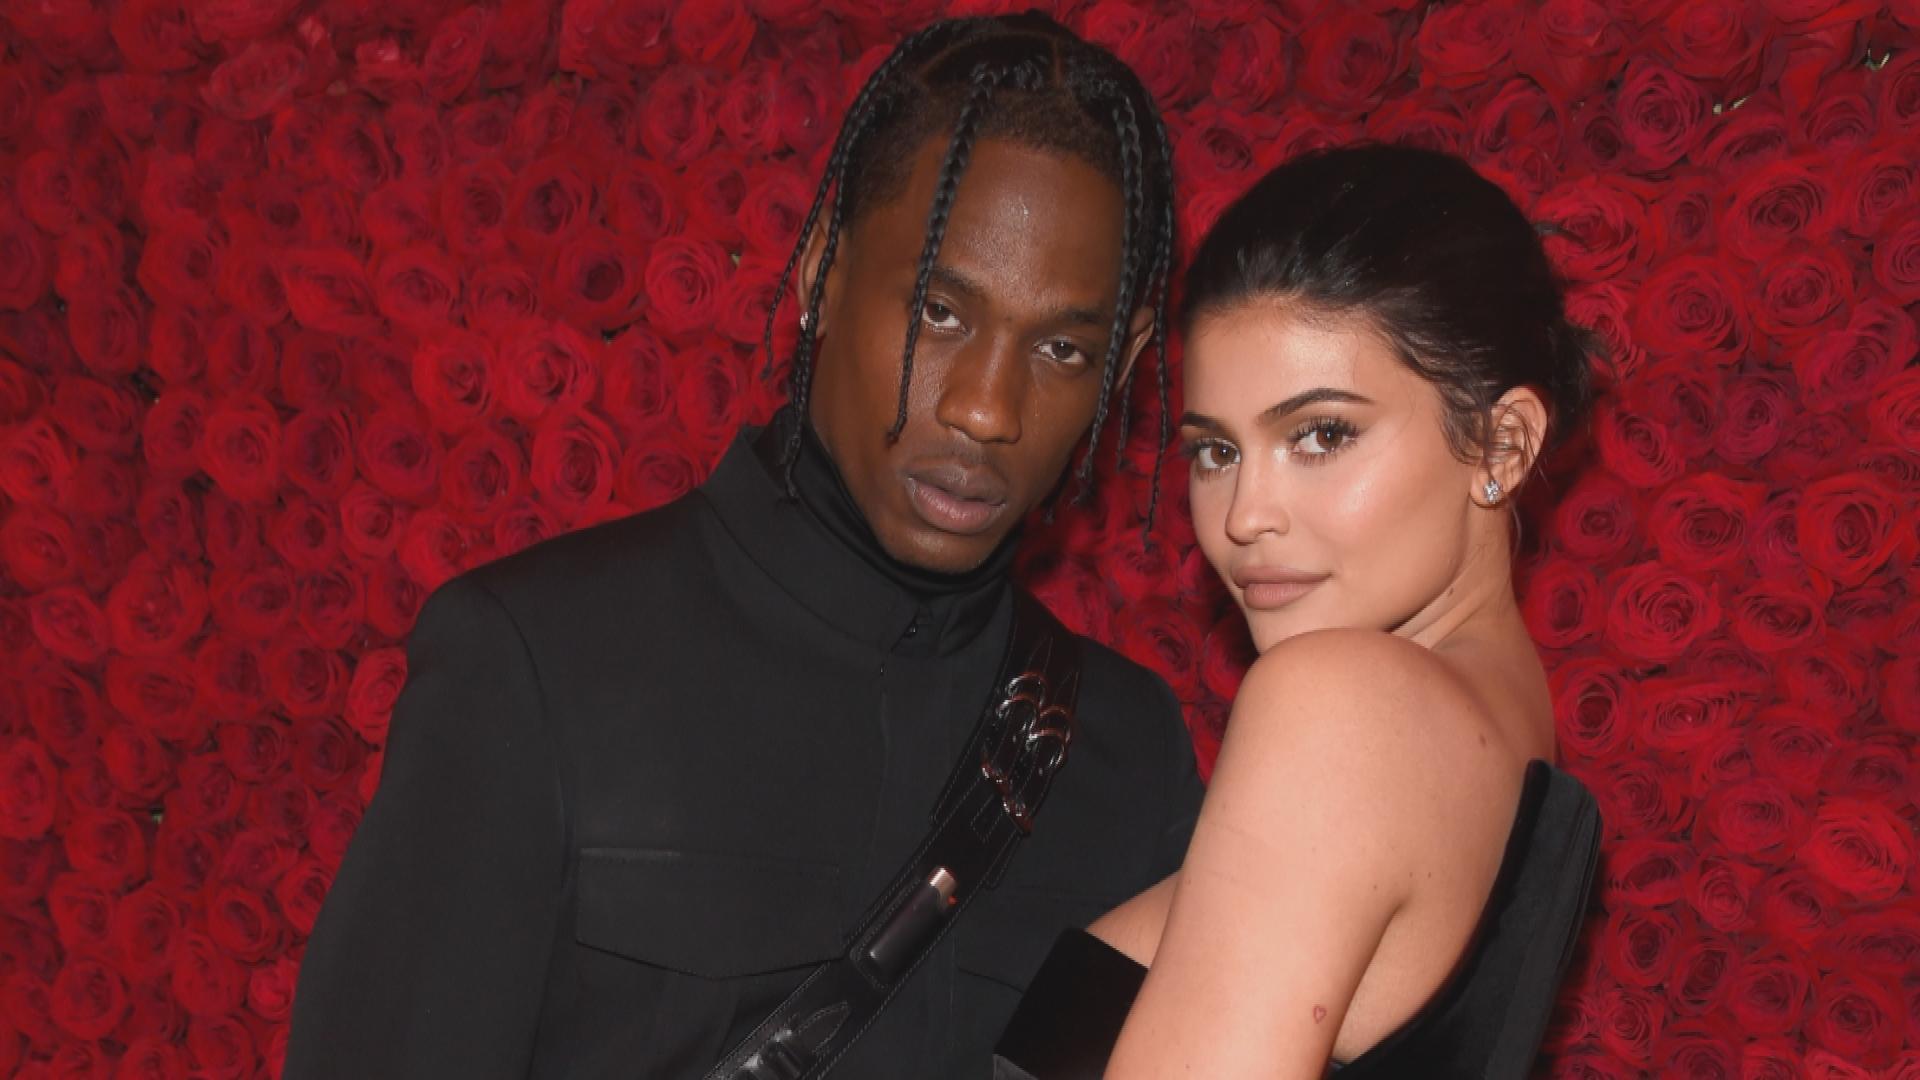 79d25bd15 Travis Scott Sends Love to 'Wifey' Kylie Jenner Following Cheating ...